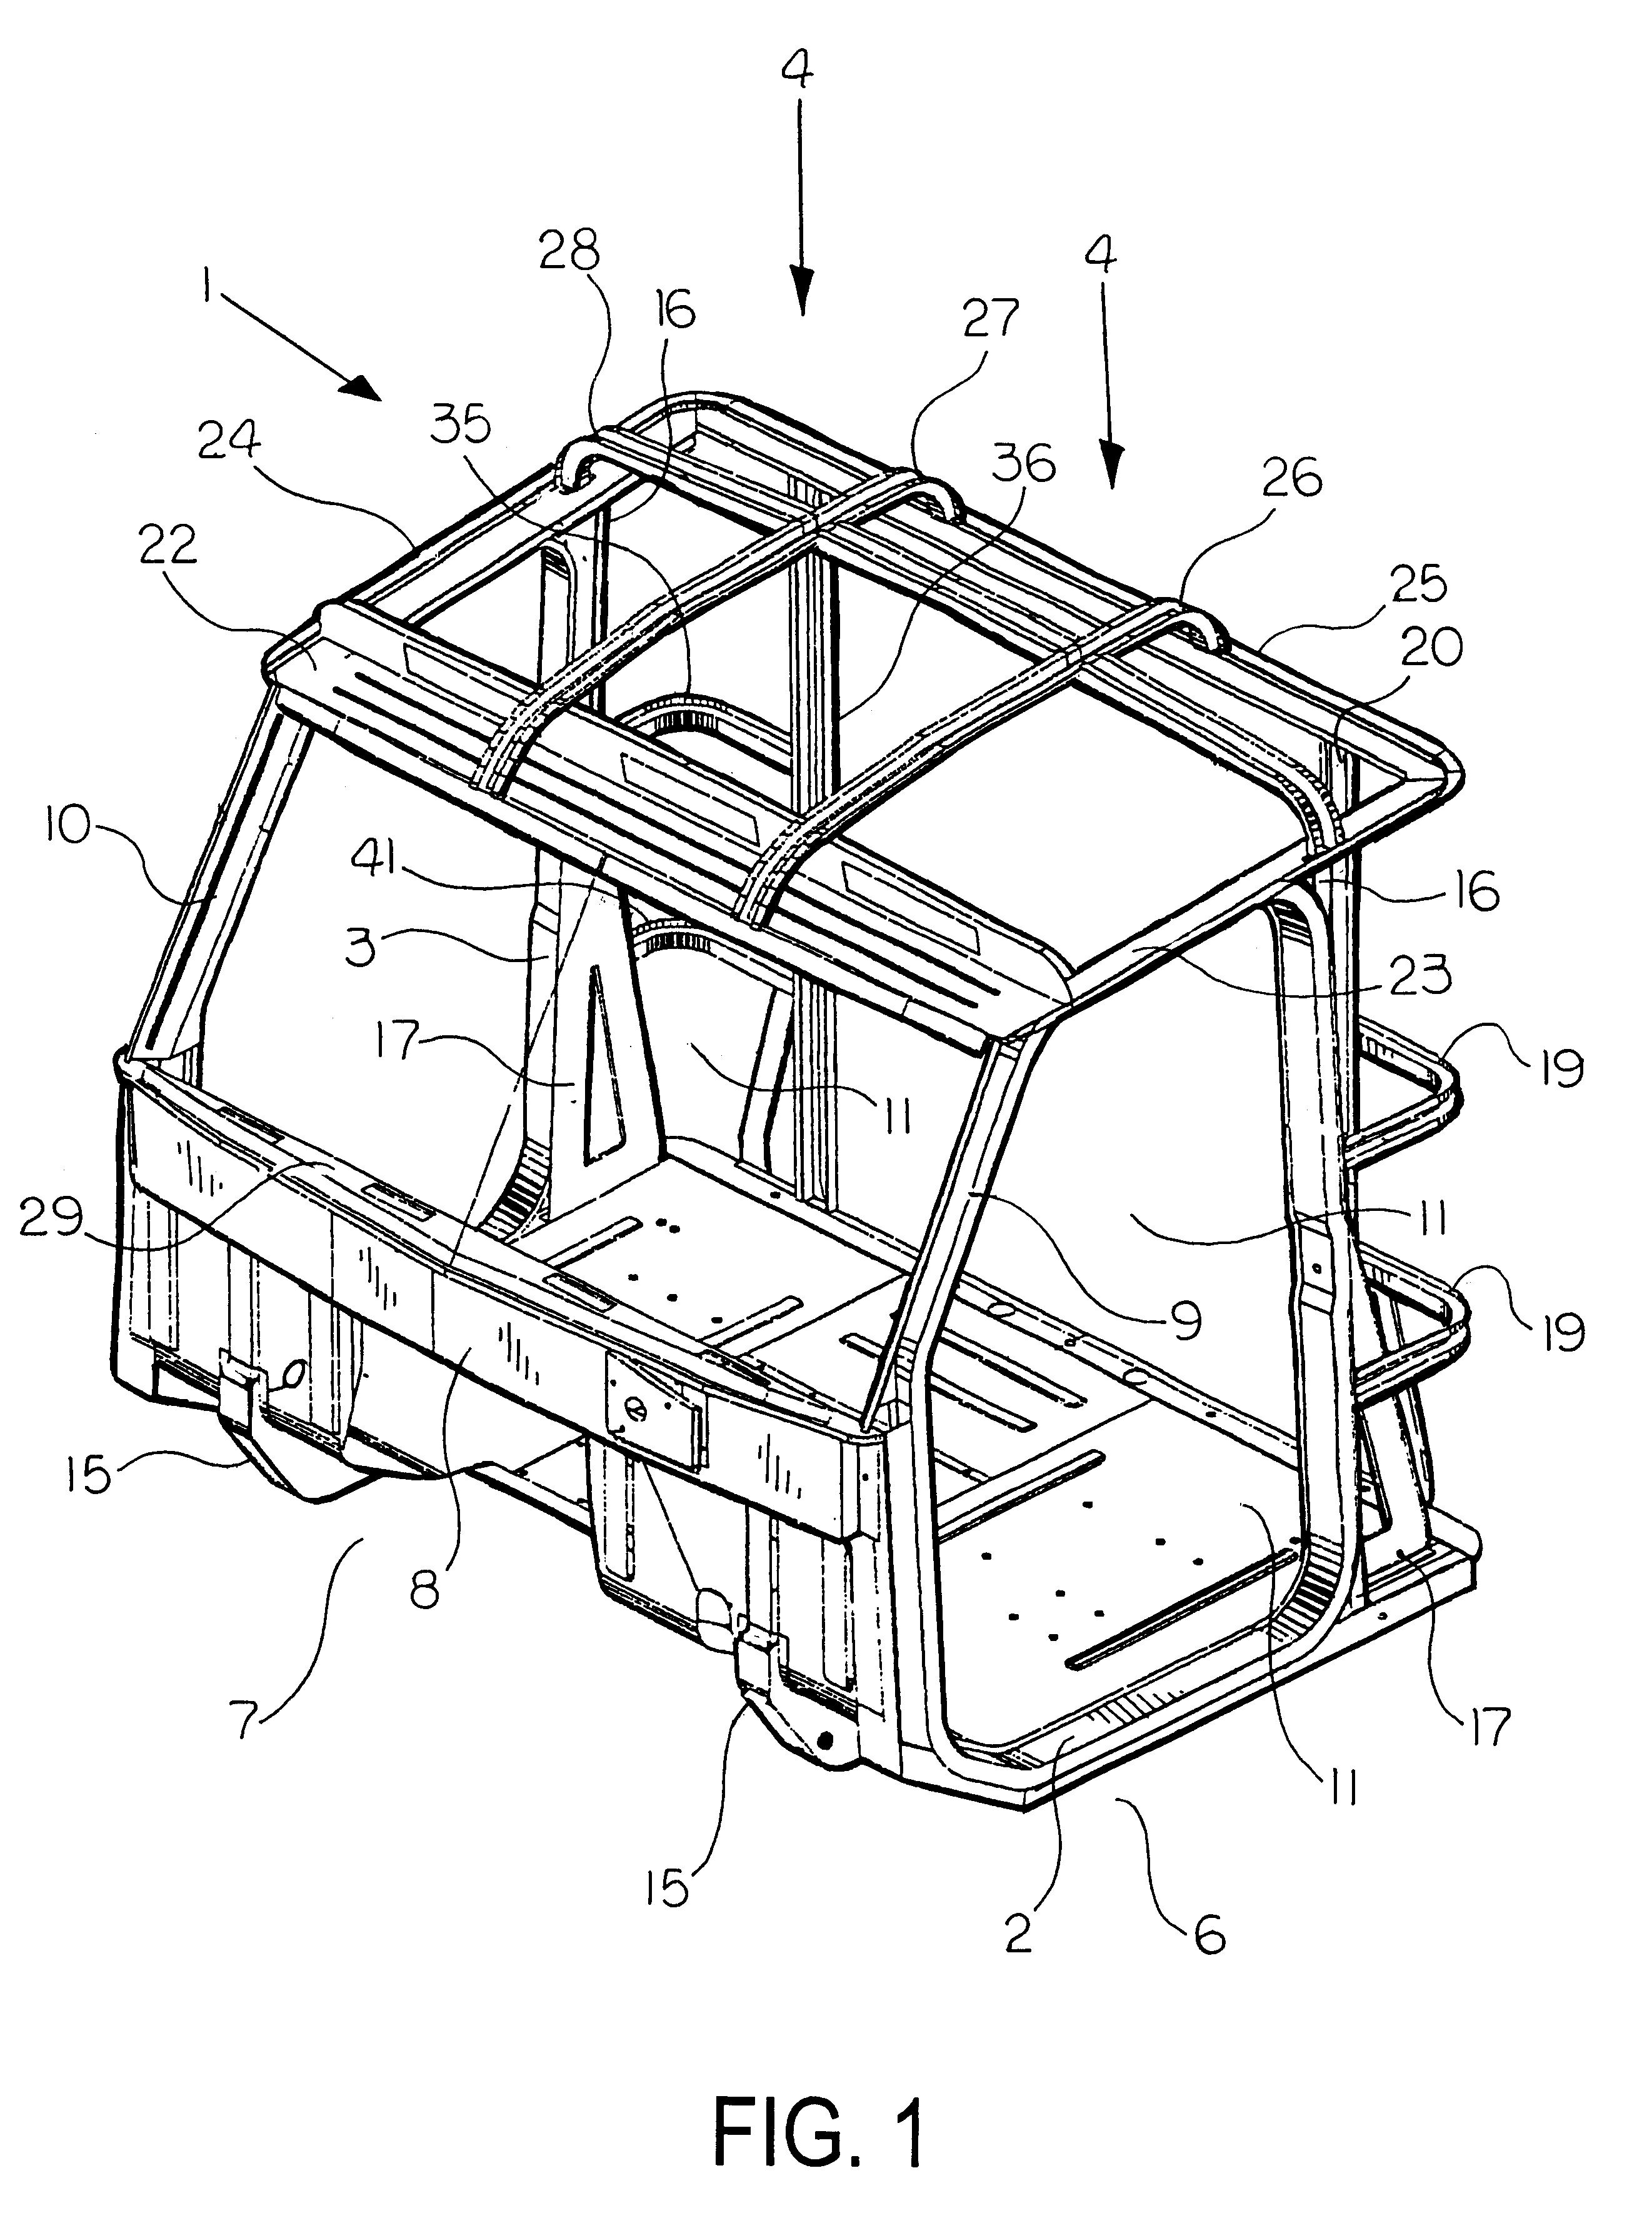 Kawasaki mule 550 wiring diagram wikishare